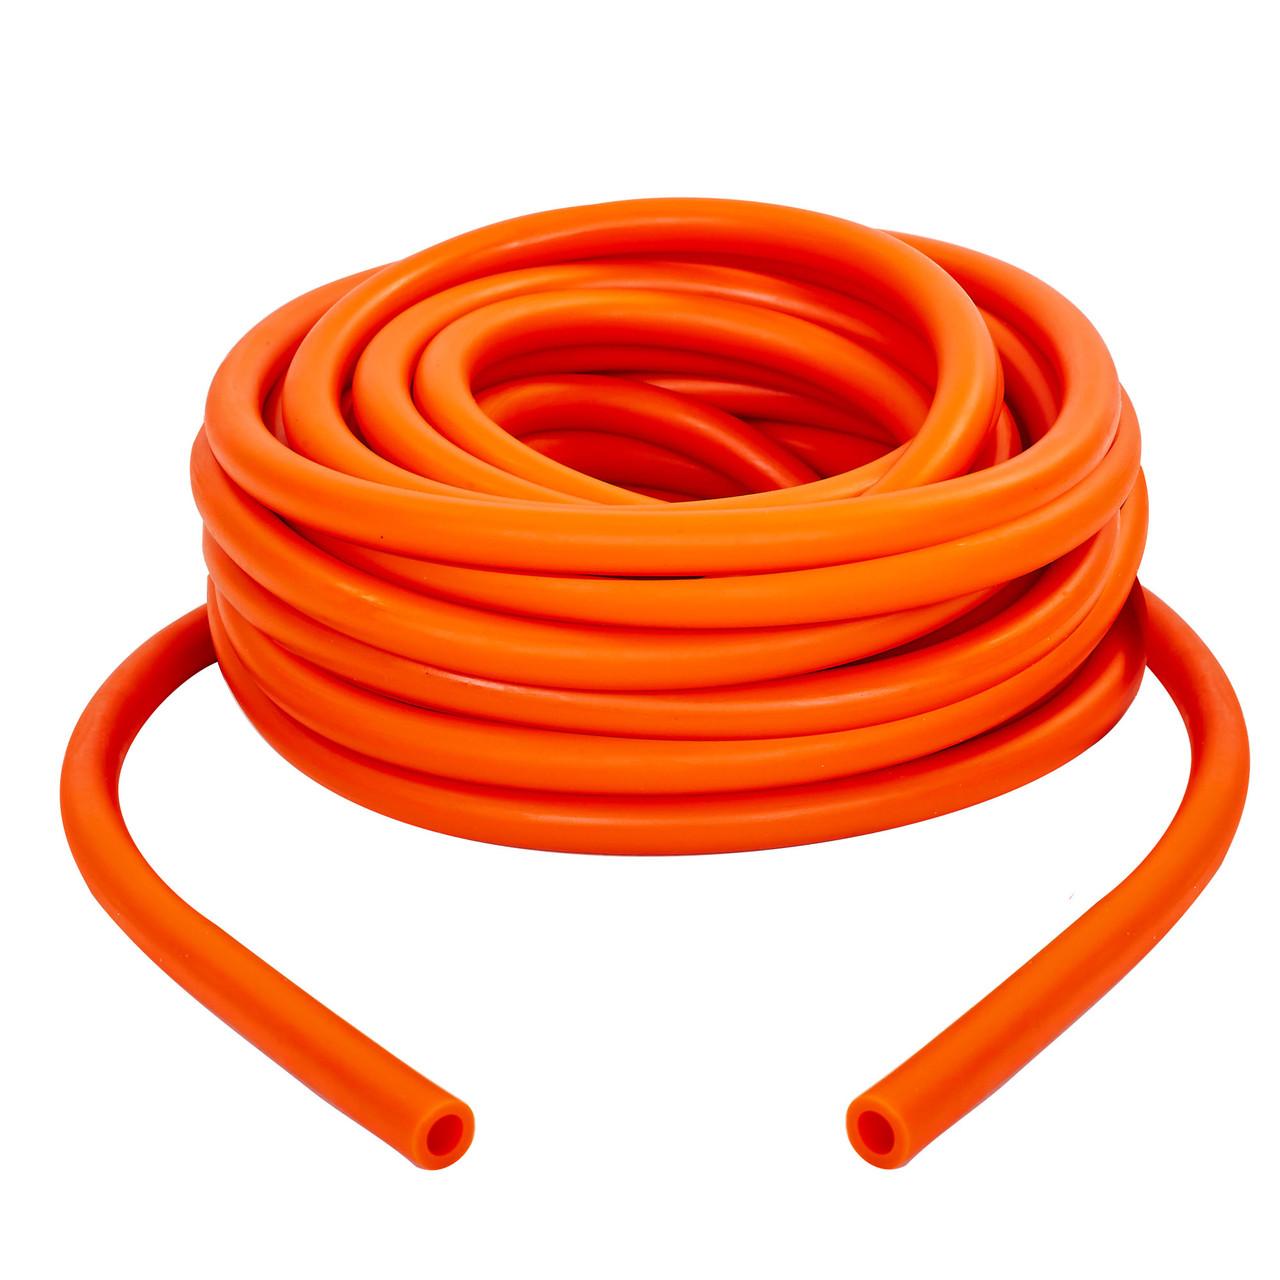 Жгут эластичный трубчатый спортивный 10 м оранжевый FI-6253-6